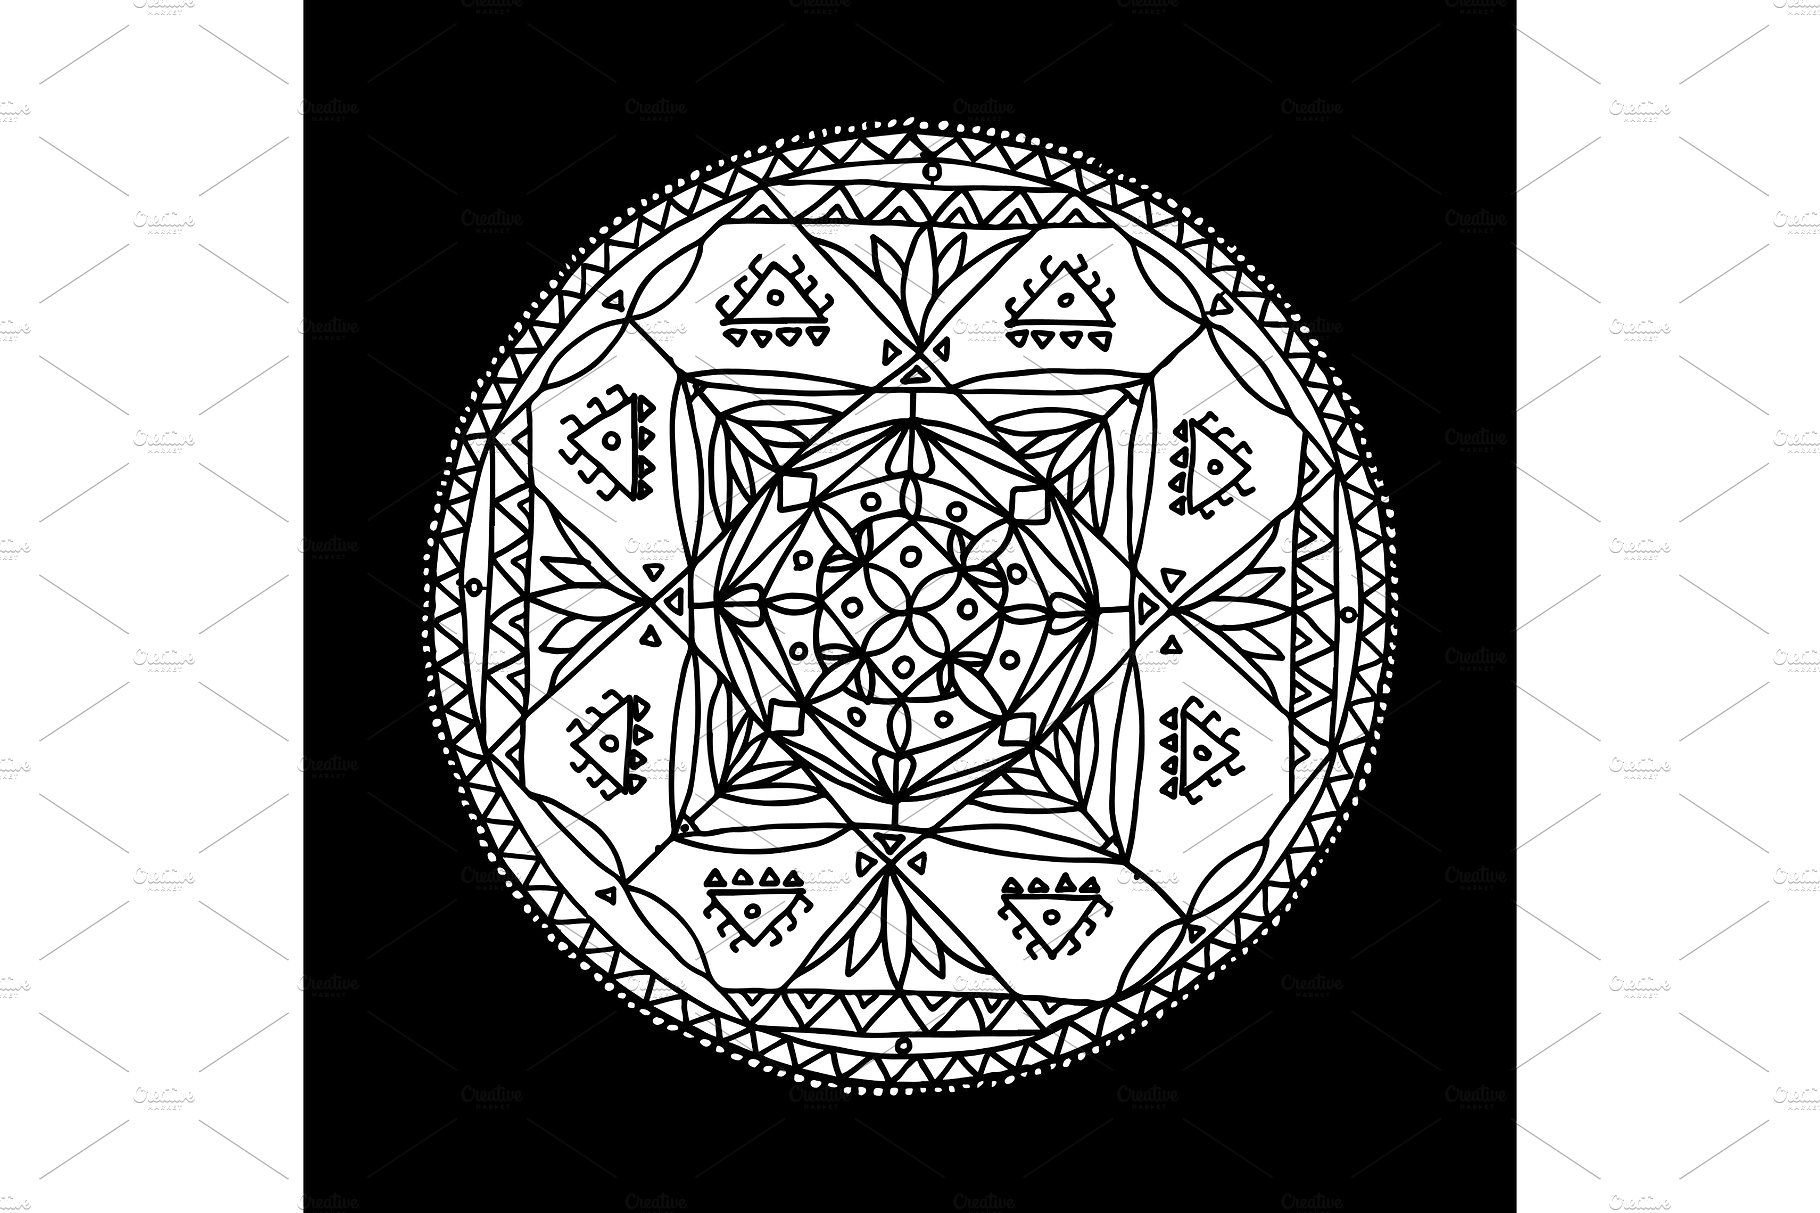 Mandala Ornament, Hand Made Sketch For Your Design  Illustrations